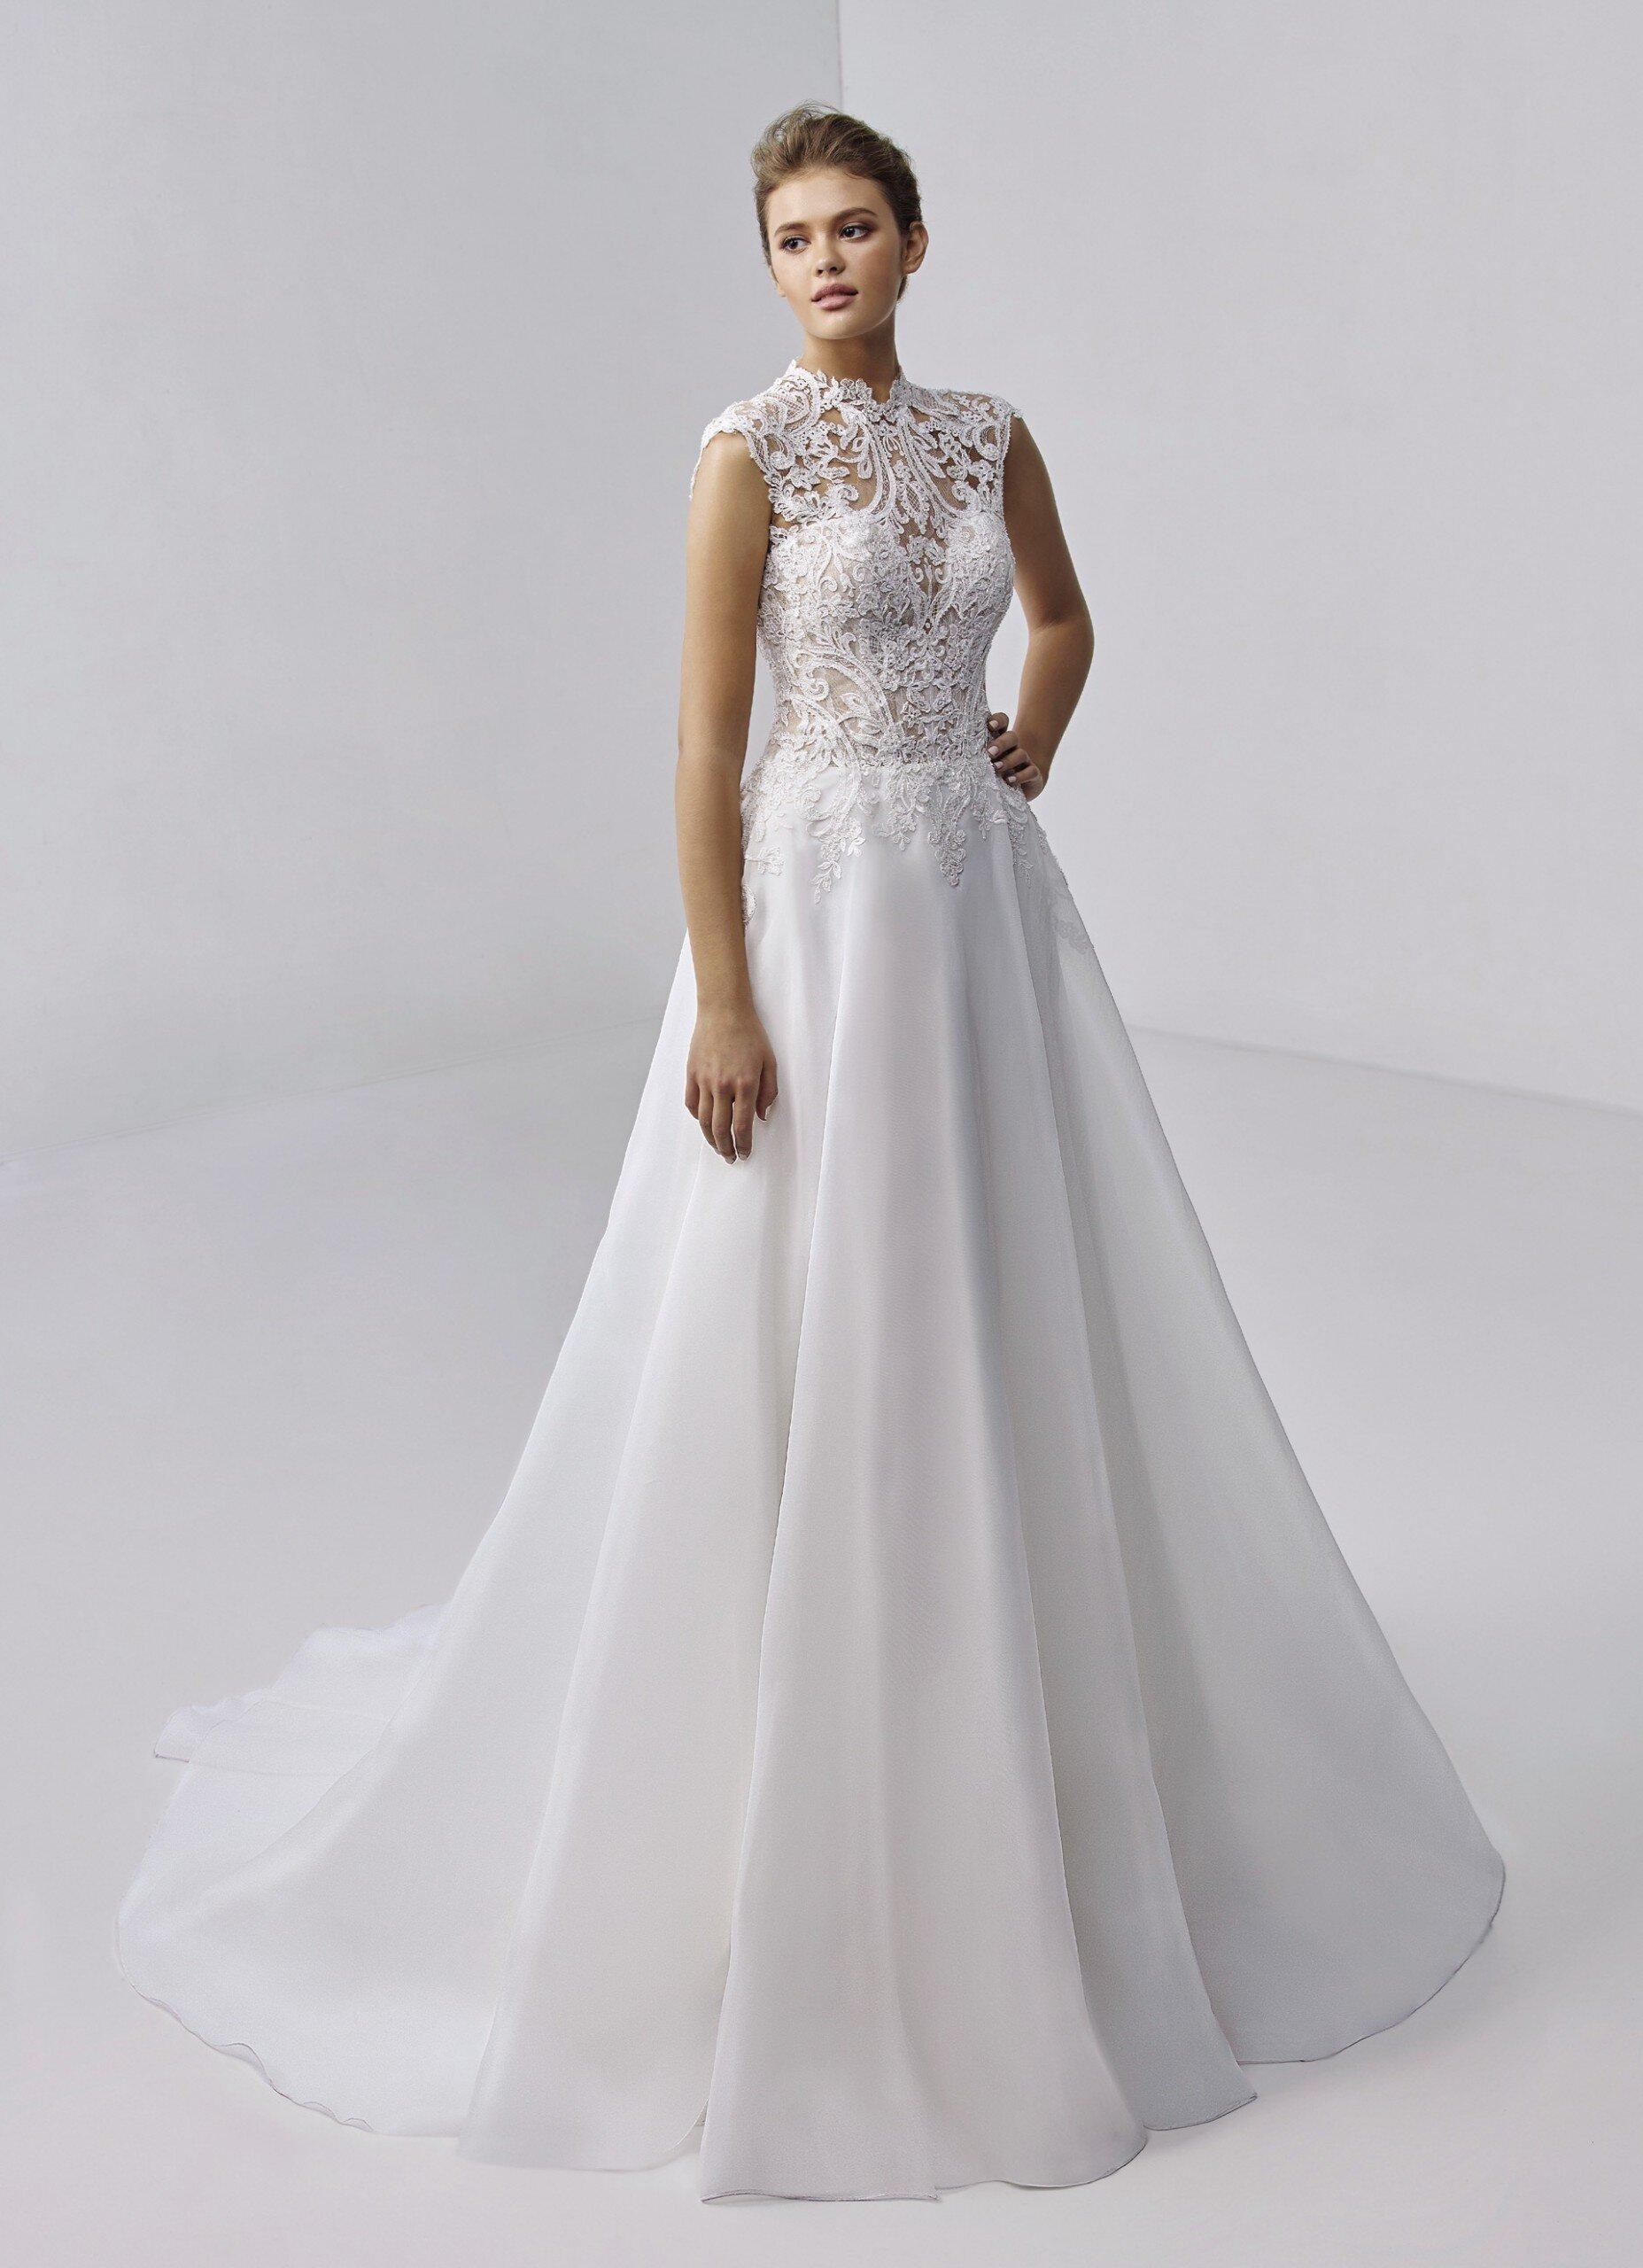 Etoile Brautmode Kollektion 2021 Modell Marjorie